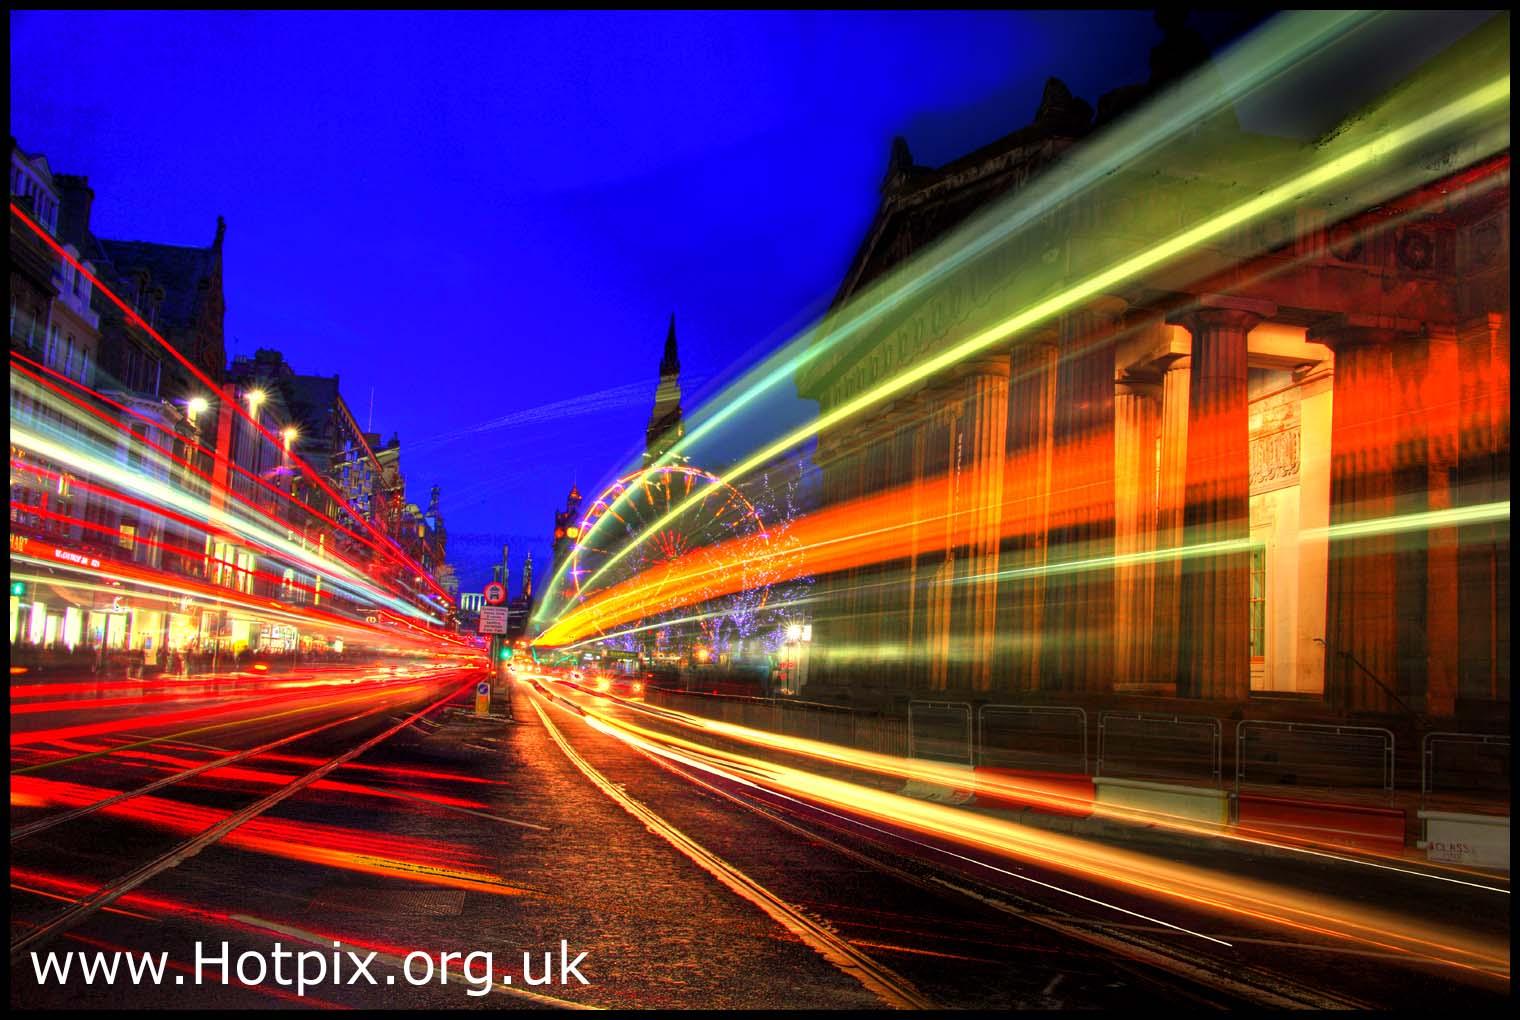 tony,smith,tonysmith,hotpix,tonysmithhotpix,fast,traffic,speed,road,edinburgh,princes,st,street,scotmand,UK,united,kingdom,dusk,night,shot,speeding,tripod,long,exposure,bulb,b,setting,tram,trams,hotpix.com,#tonysmithotpix,edimburgh